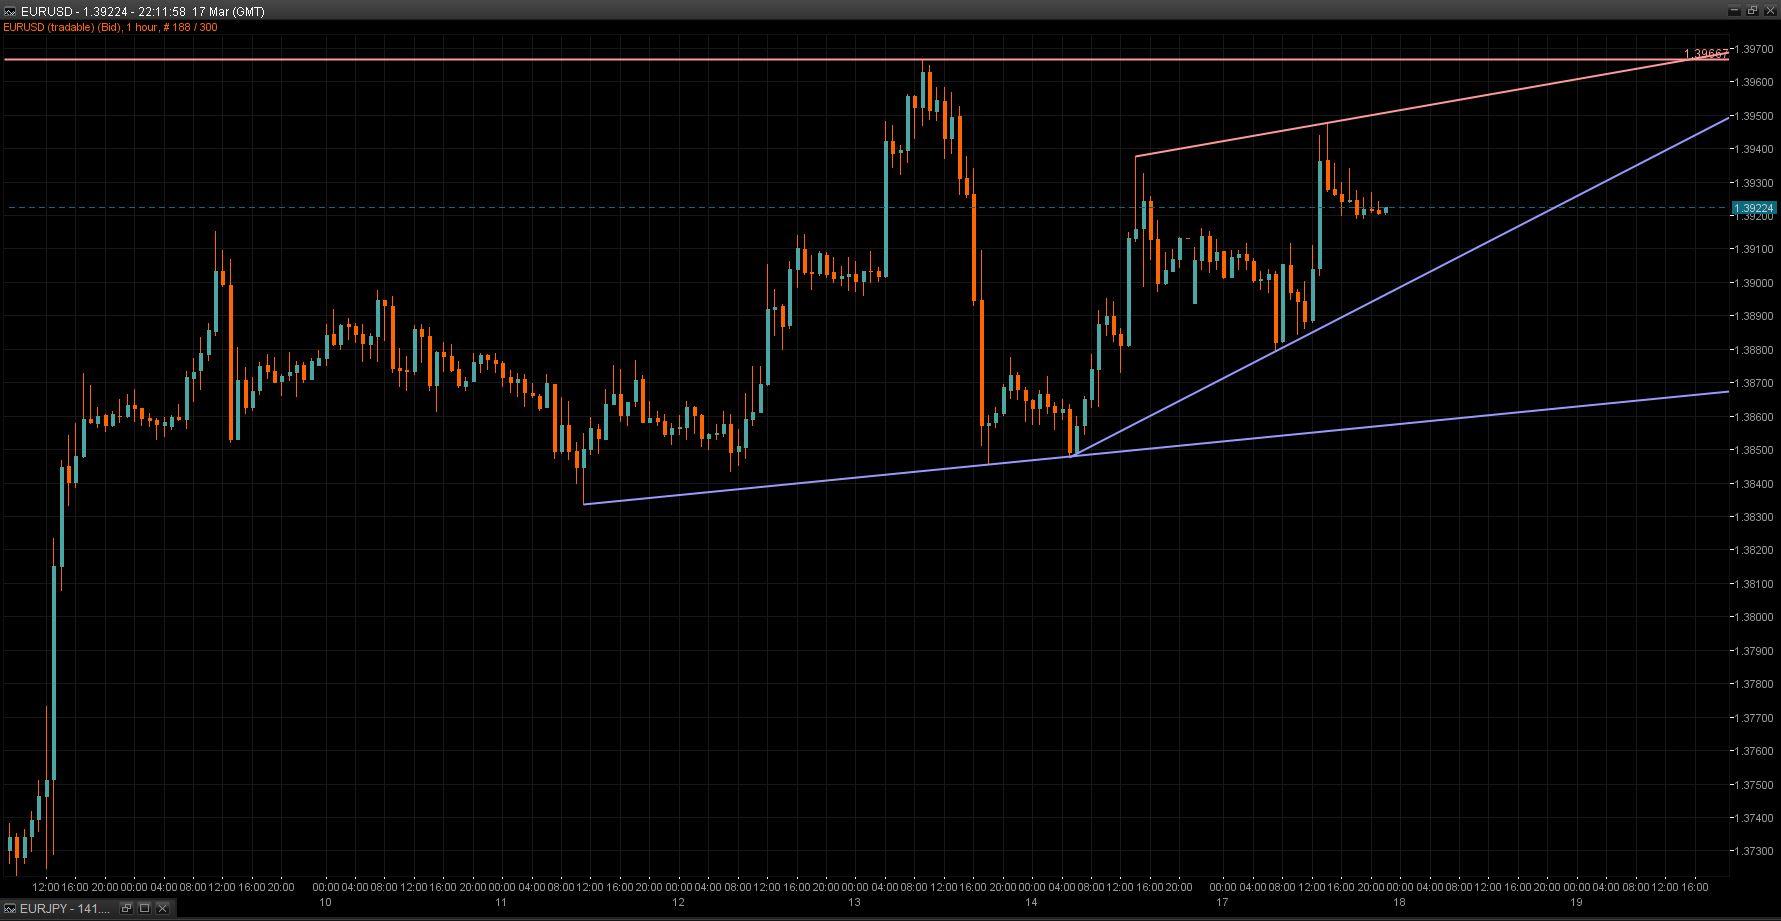 EUR/USD Chart 18 Mar 2014